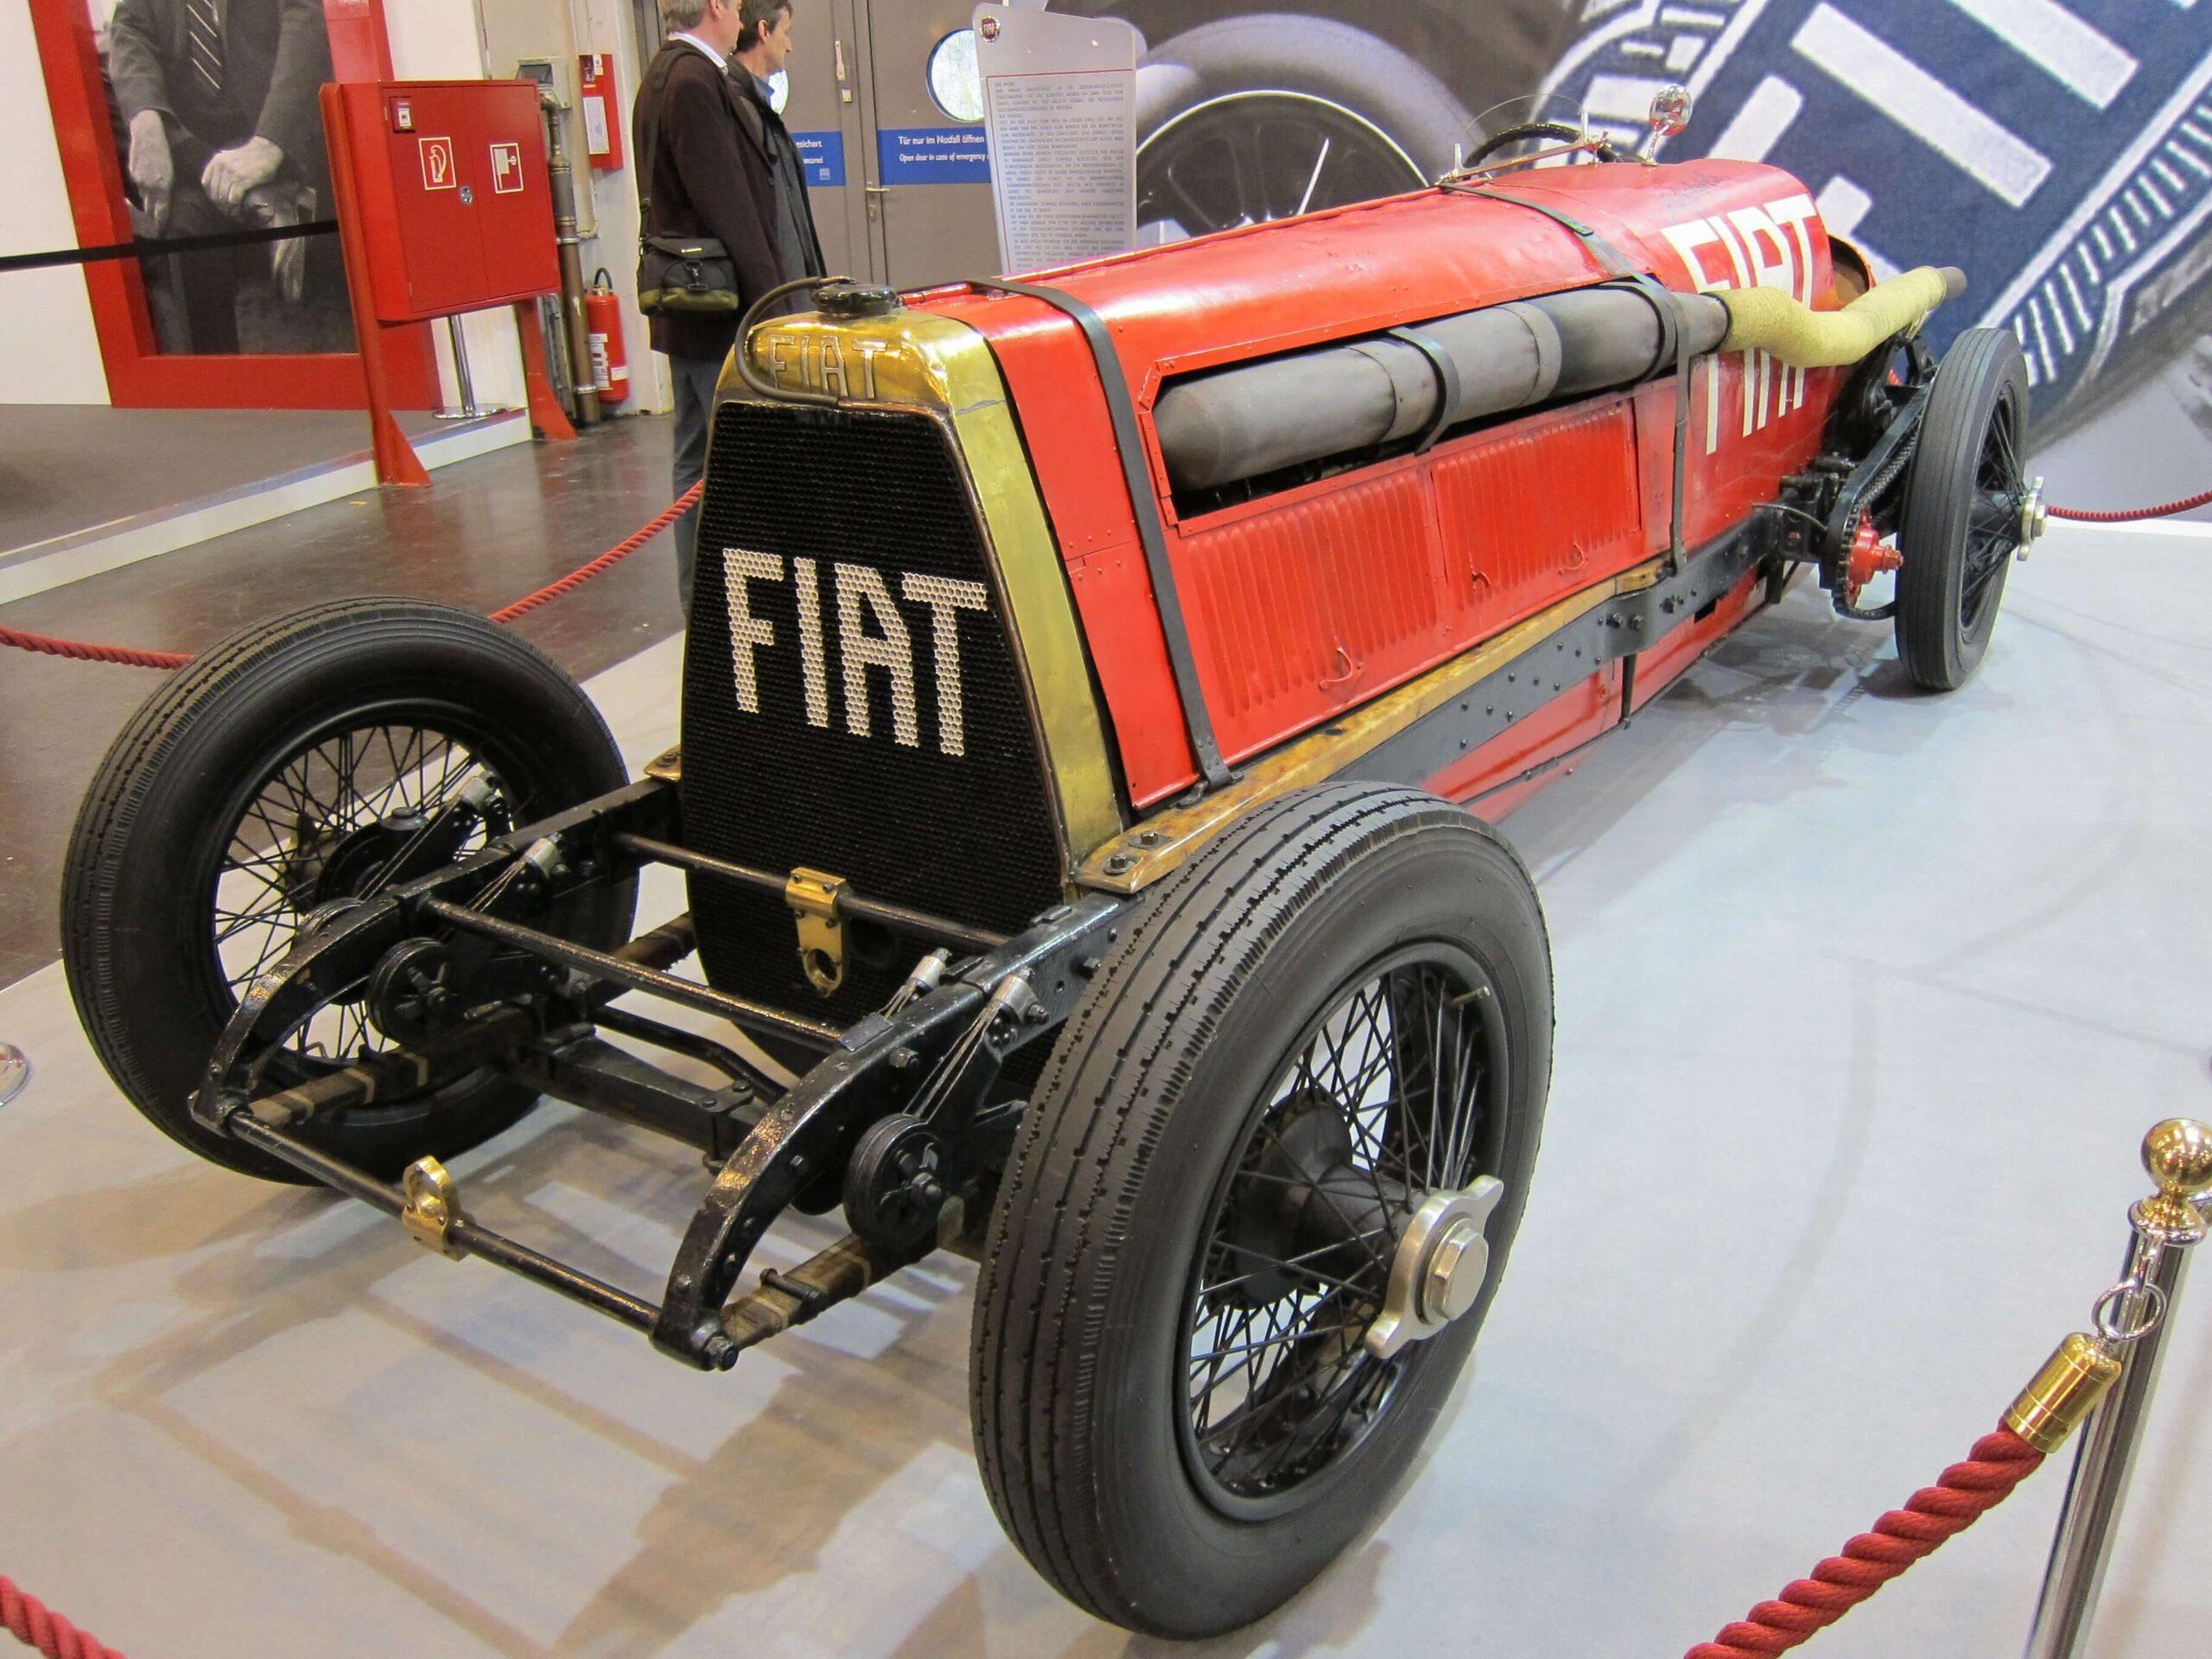 Fiat SB4 Mefistofele